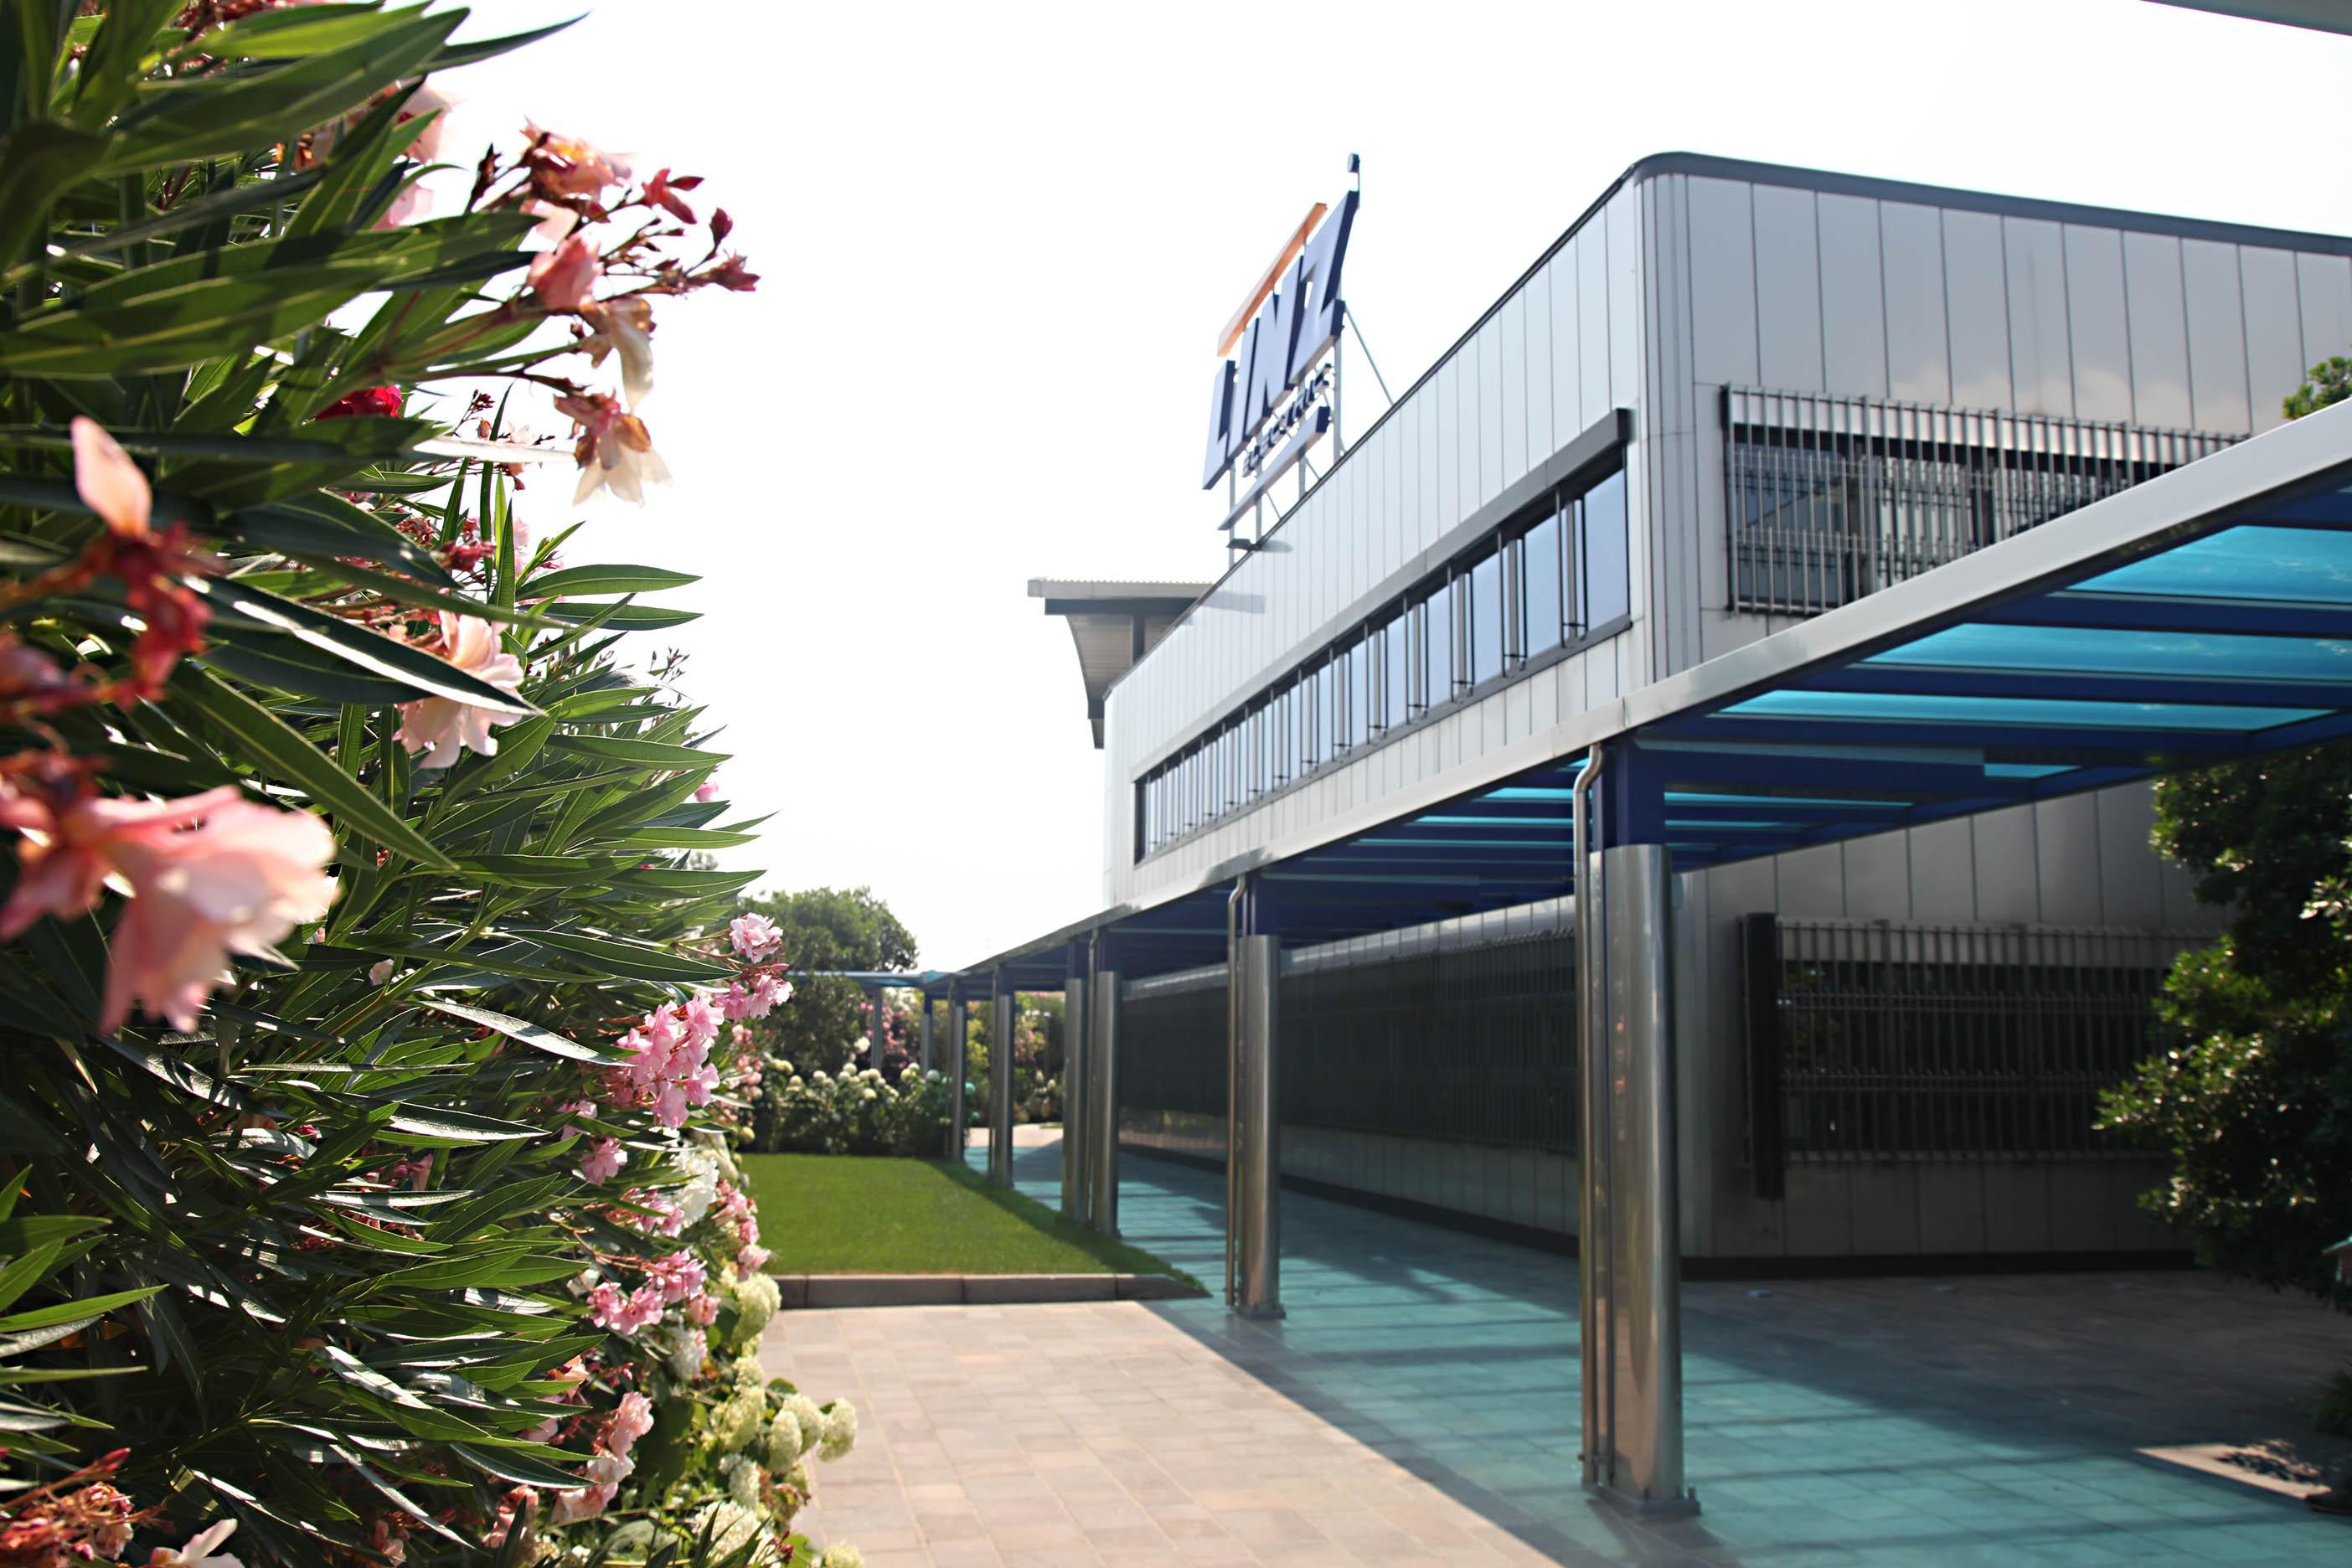 Linz Electric - مقرات الشركة